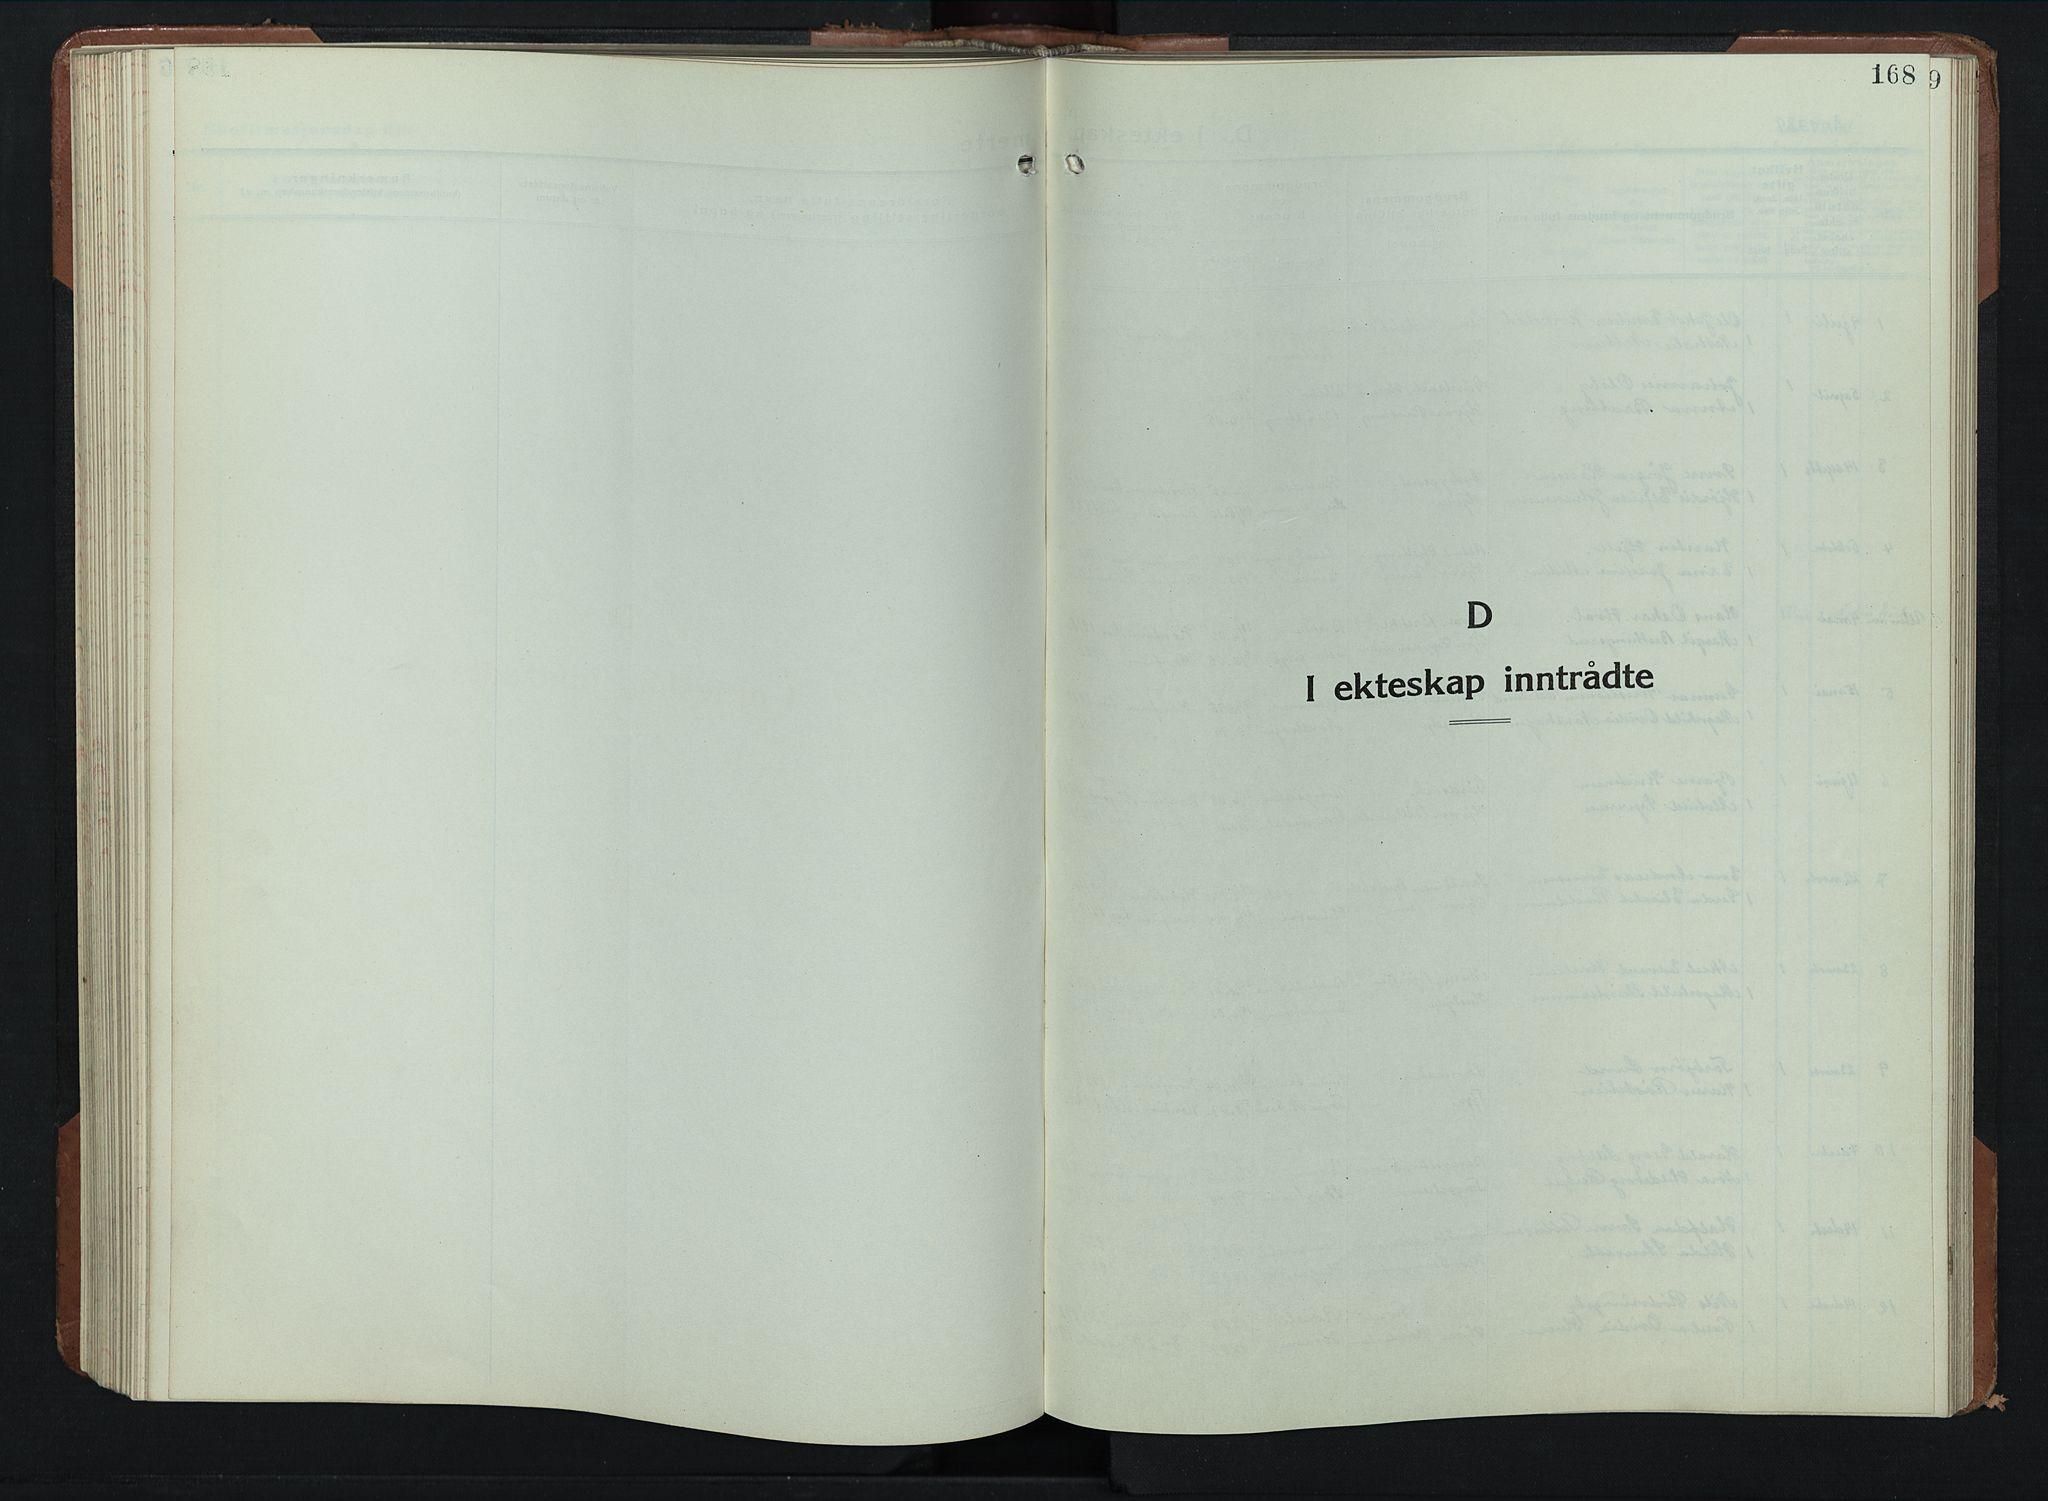 SAH, Balke prestekontor, Klokkerbok nr. 2, 1929-1951, s. 168